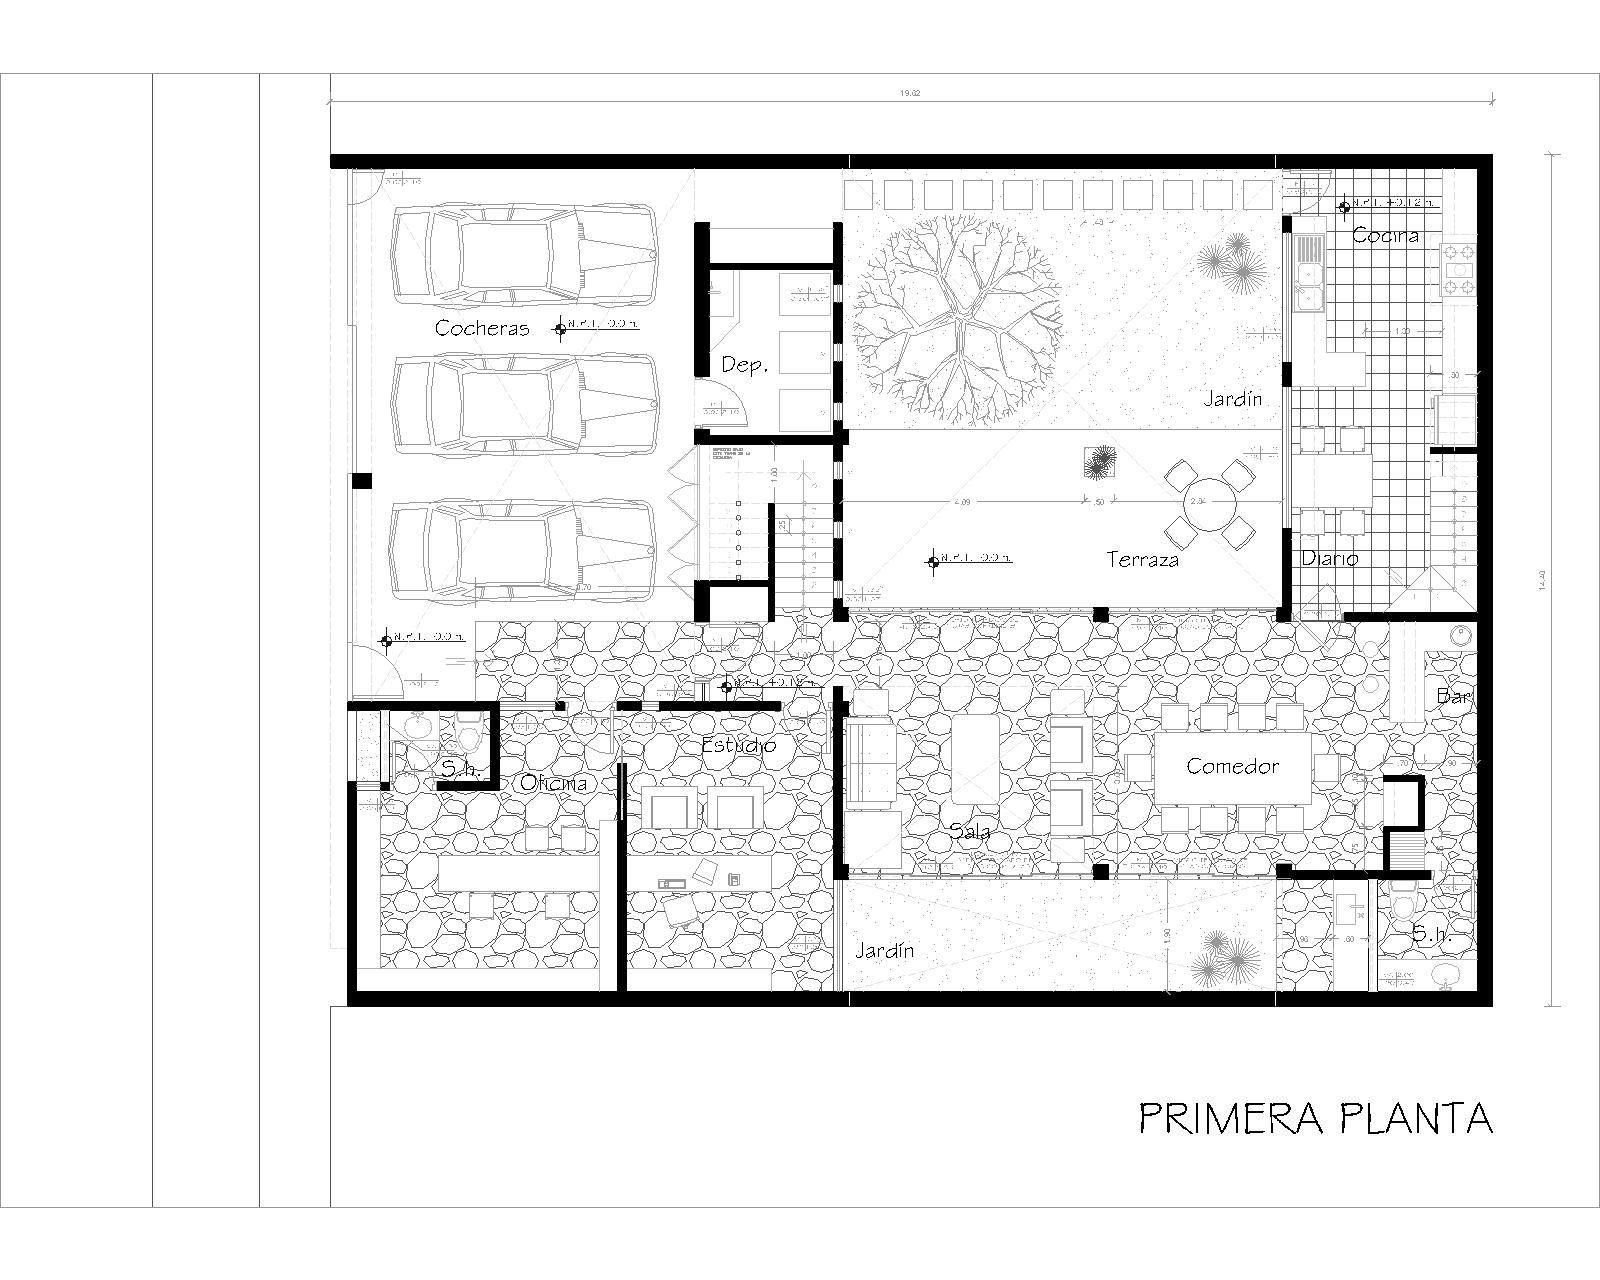 La forma moderna en la arquitectura casas patio 2 for Casa vivienda jardin pdf